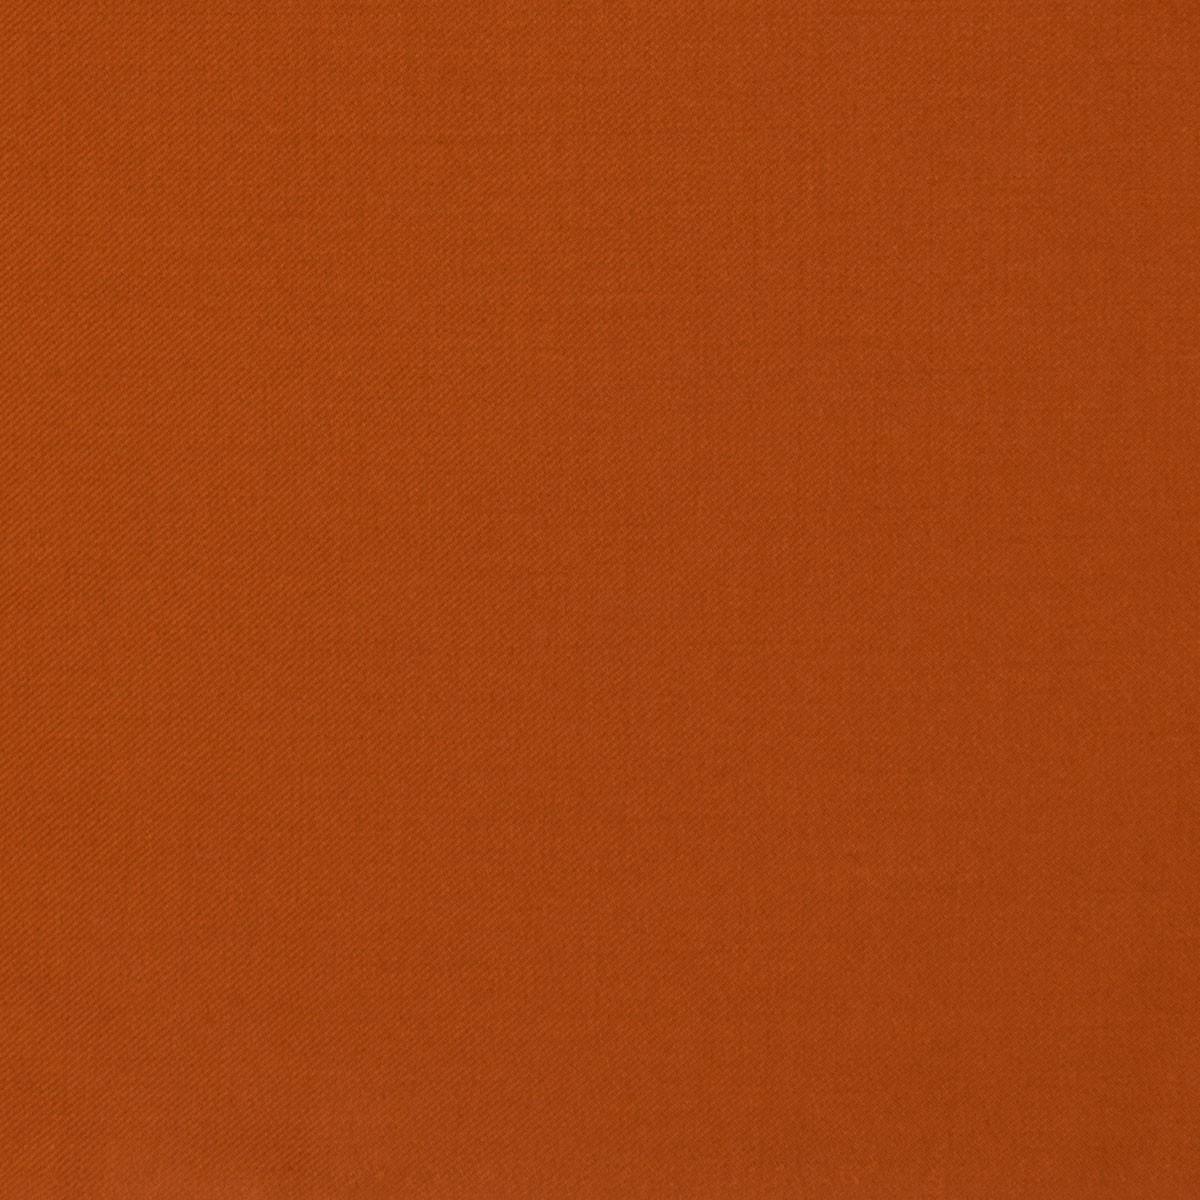 Saffron Ancient Medium Weight Tartan Fabric-Front